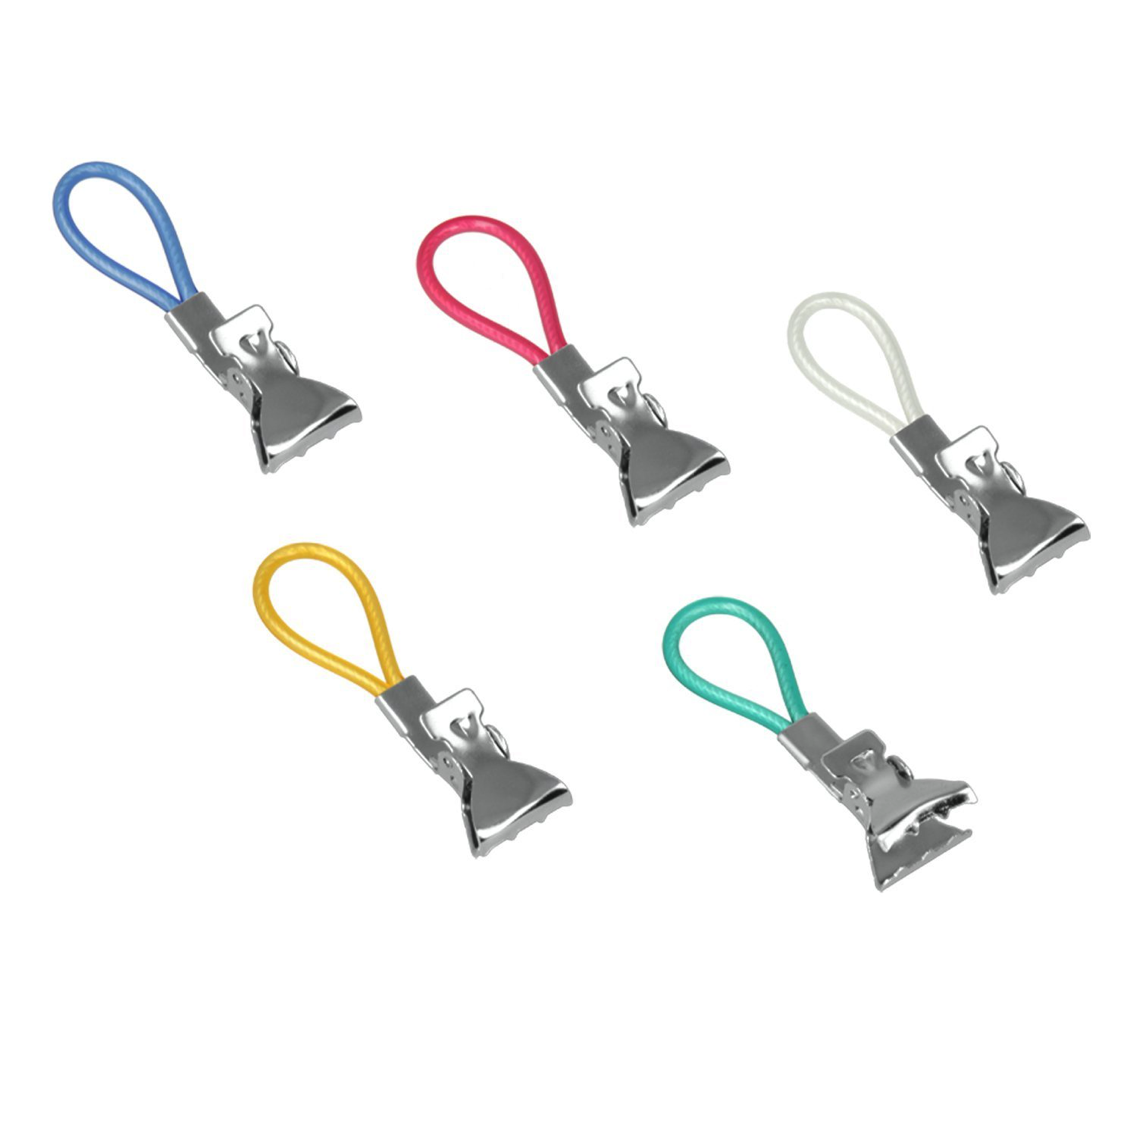 5 Piece Clips Towel Cloth Hanging Clips Metal Assorted Colour 2cm Clip 2821